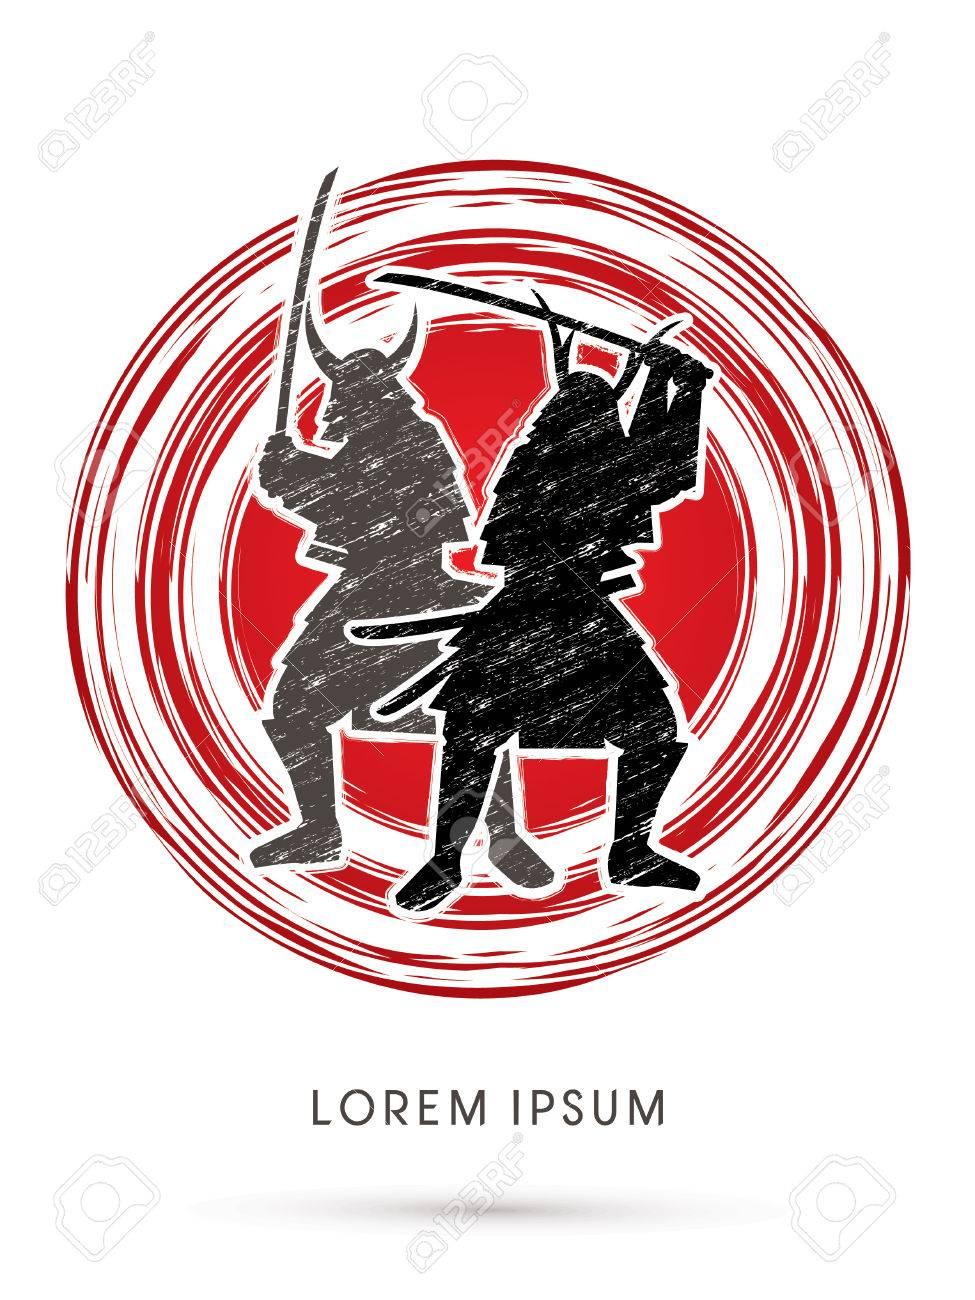 Silhouette Twin Samurai Warrior With Sword Designed Using Grunge